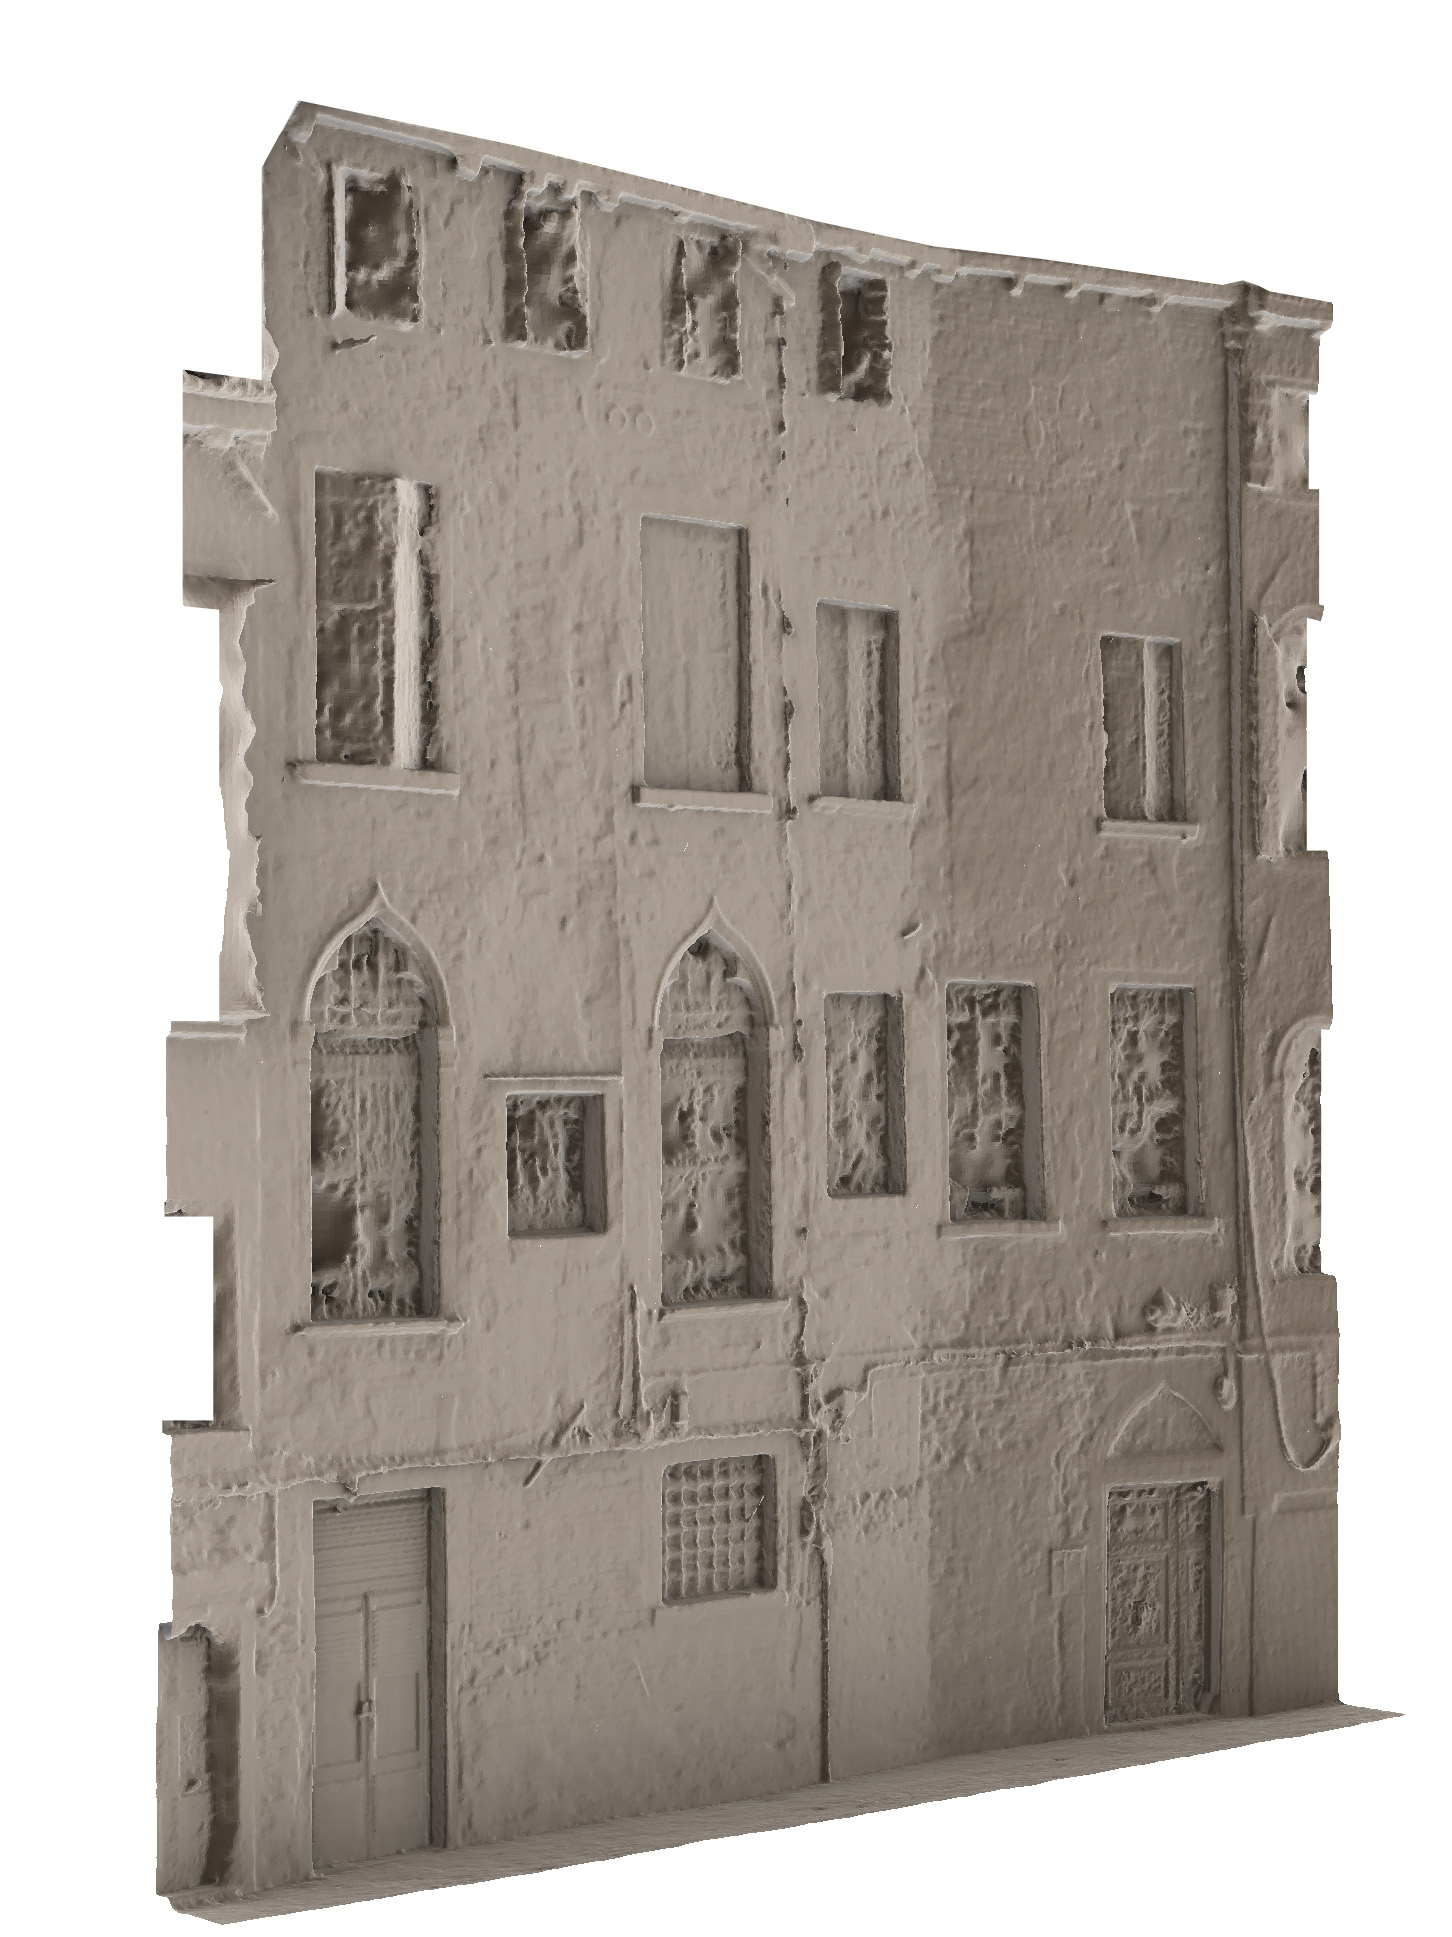 Rilievo fotogrammetrico facciata calle - mesh